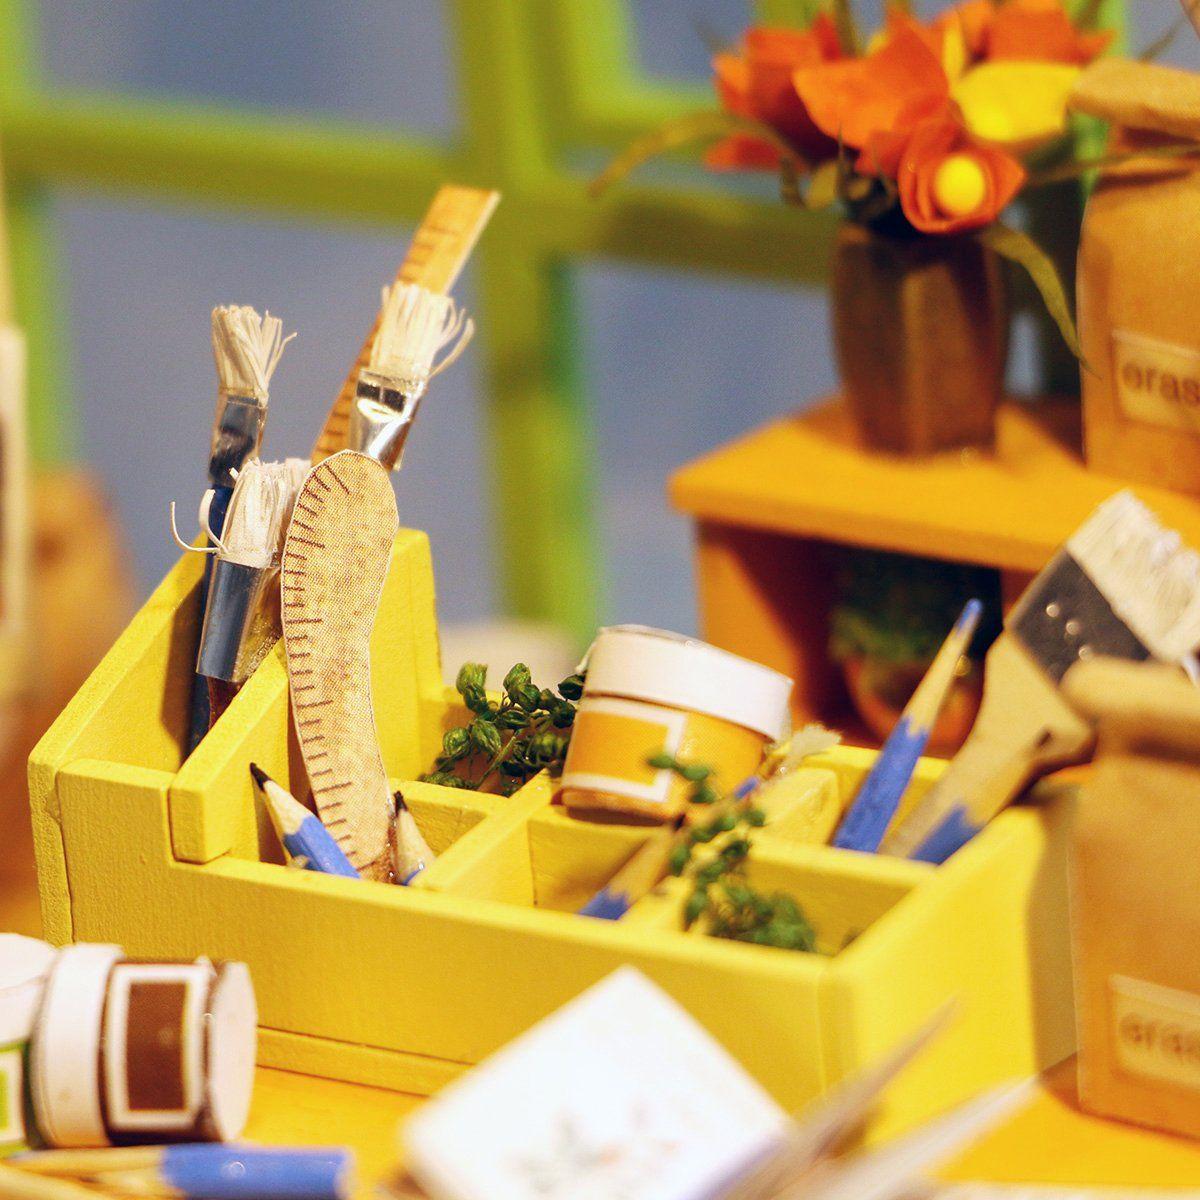 Christmas Sale Miniature Dollhouse Diy Kit With Led Light Art Studio Building Crafts Puzzles Mini Toys Top Chr Dollhouse Toys Dollhouse Miniatures Diy Toys